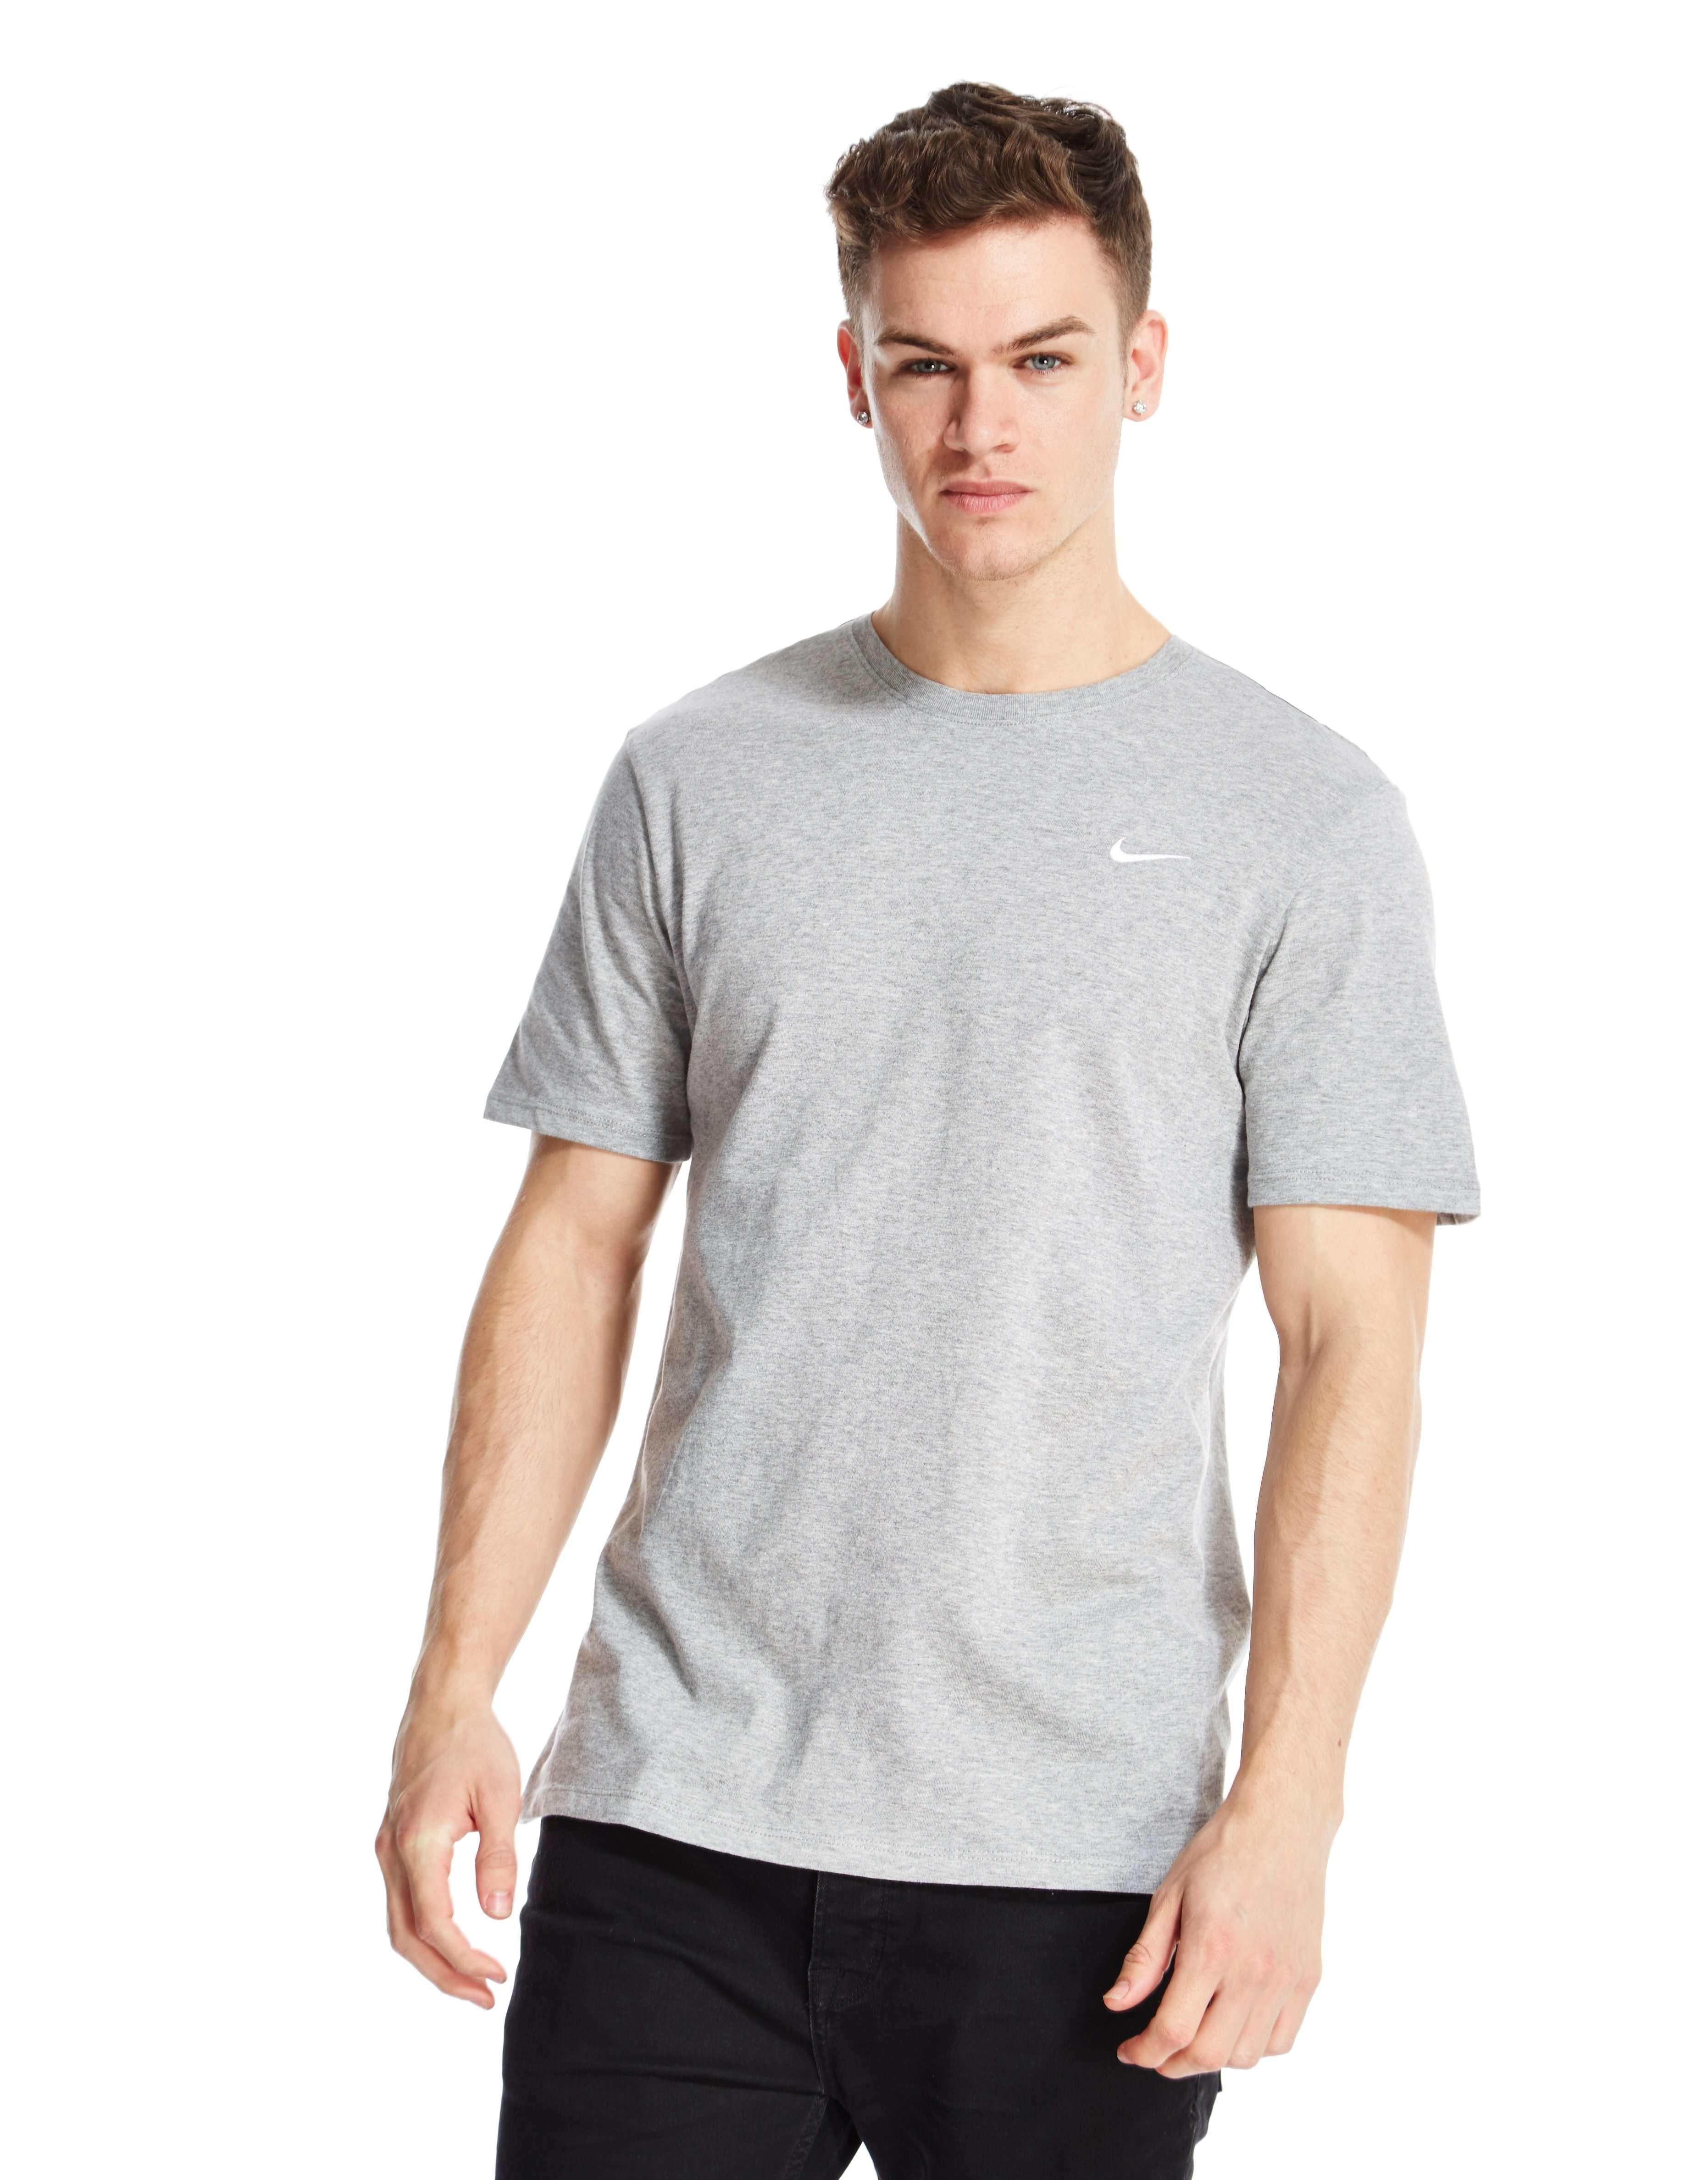 Nike Foundation T-Shirt